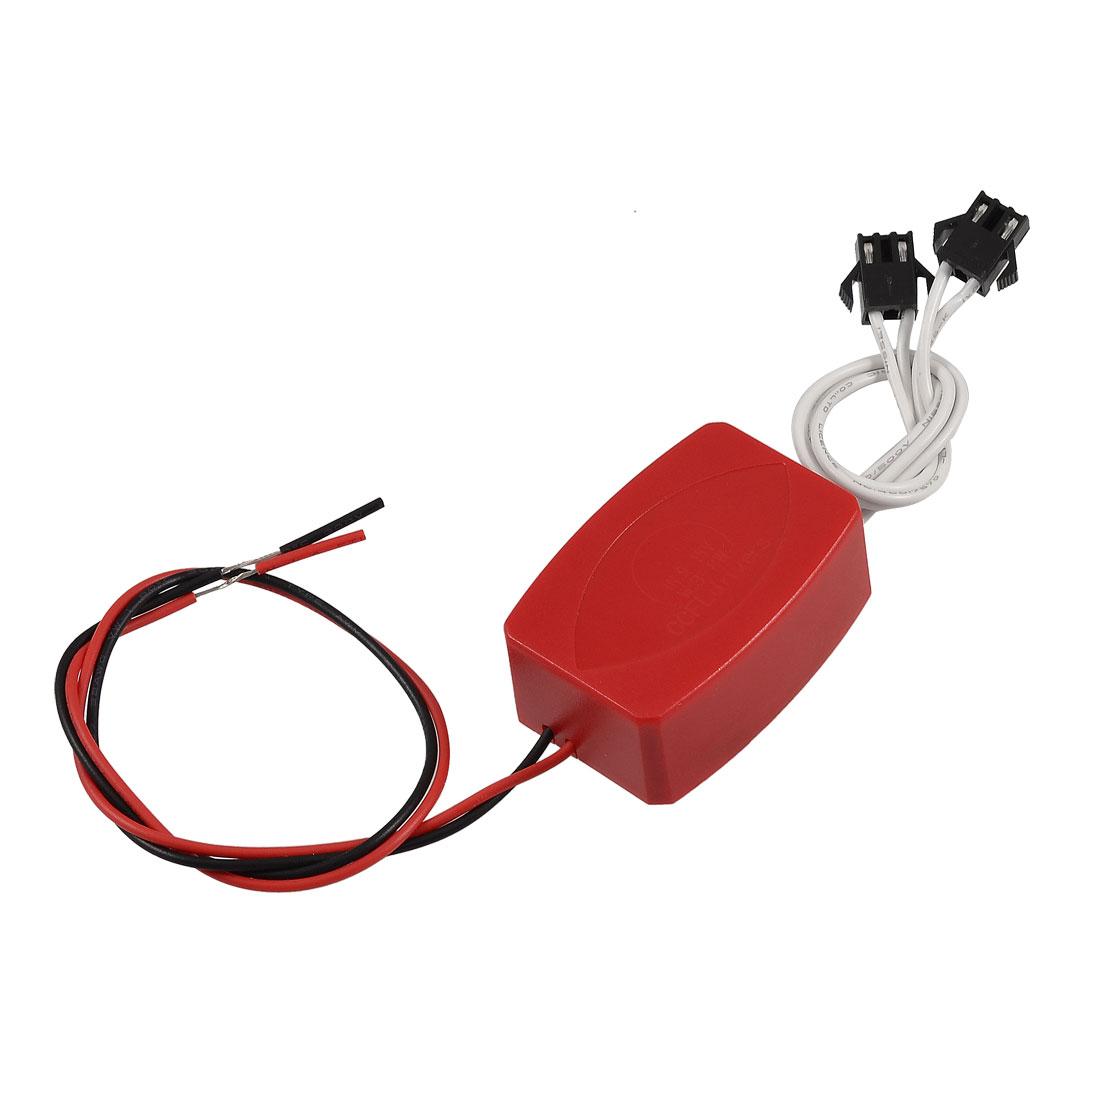 LED Light Driver Power Supply DC9-16V 3-8W Transformer Red